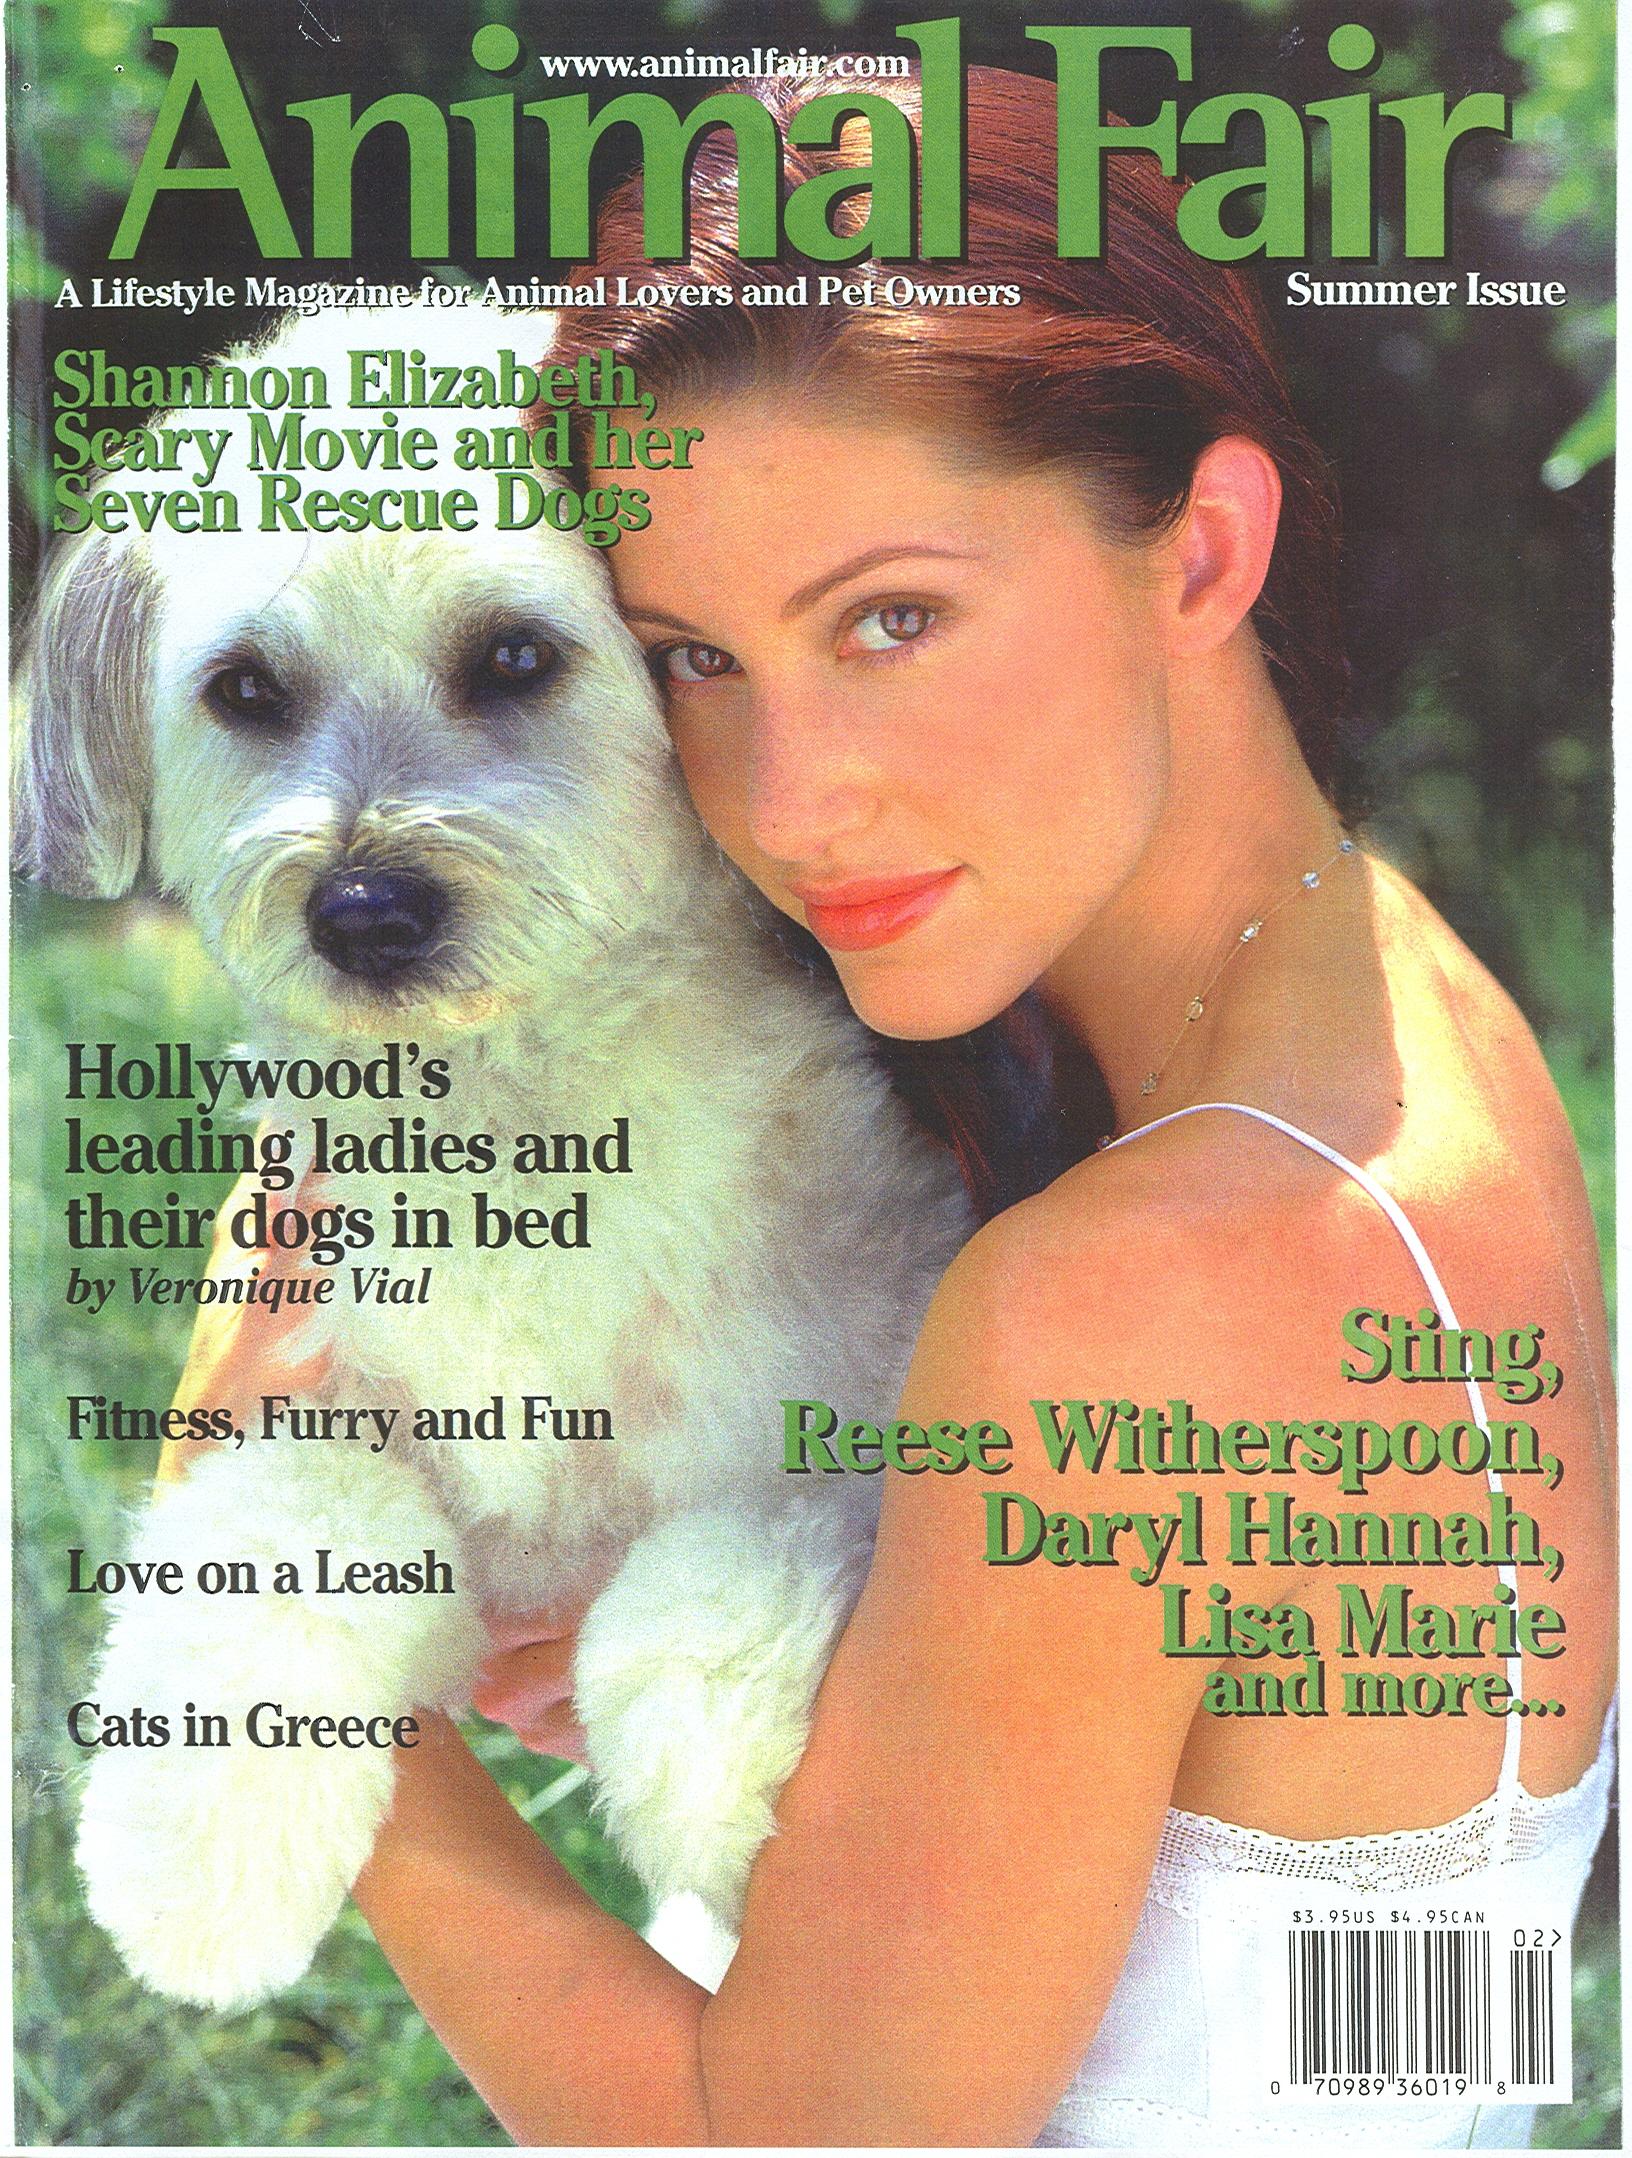 SE_Animal Fair_Summer Issue_1.jpg